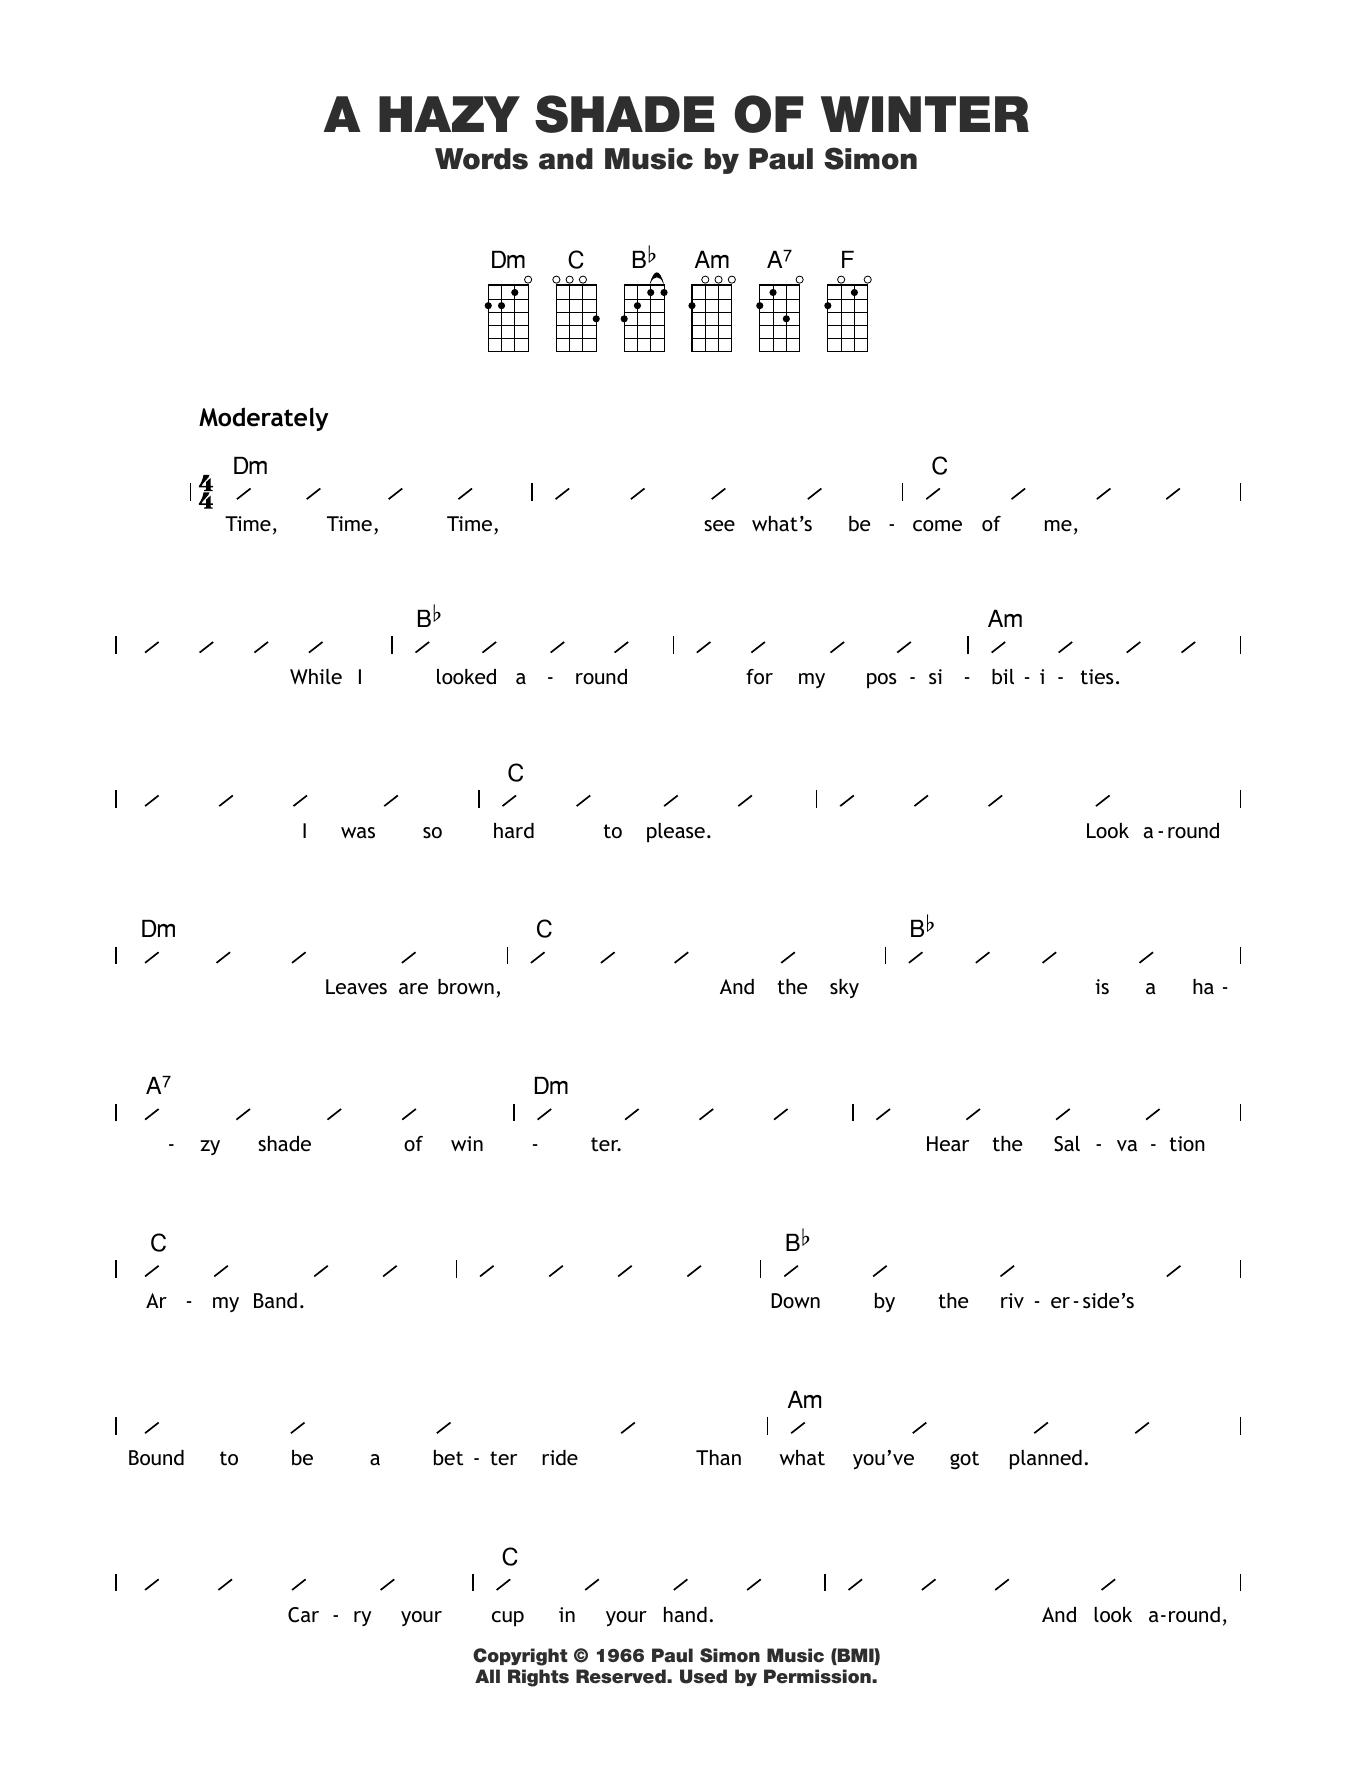 A Hazy Shade Of Winter Sheet Music